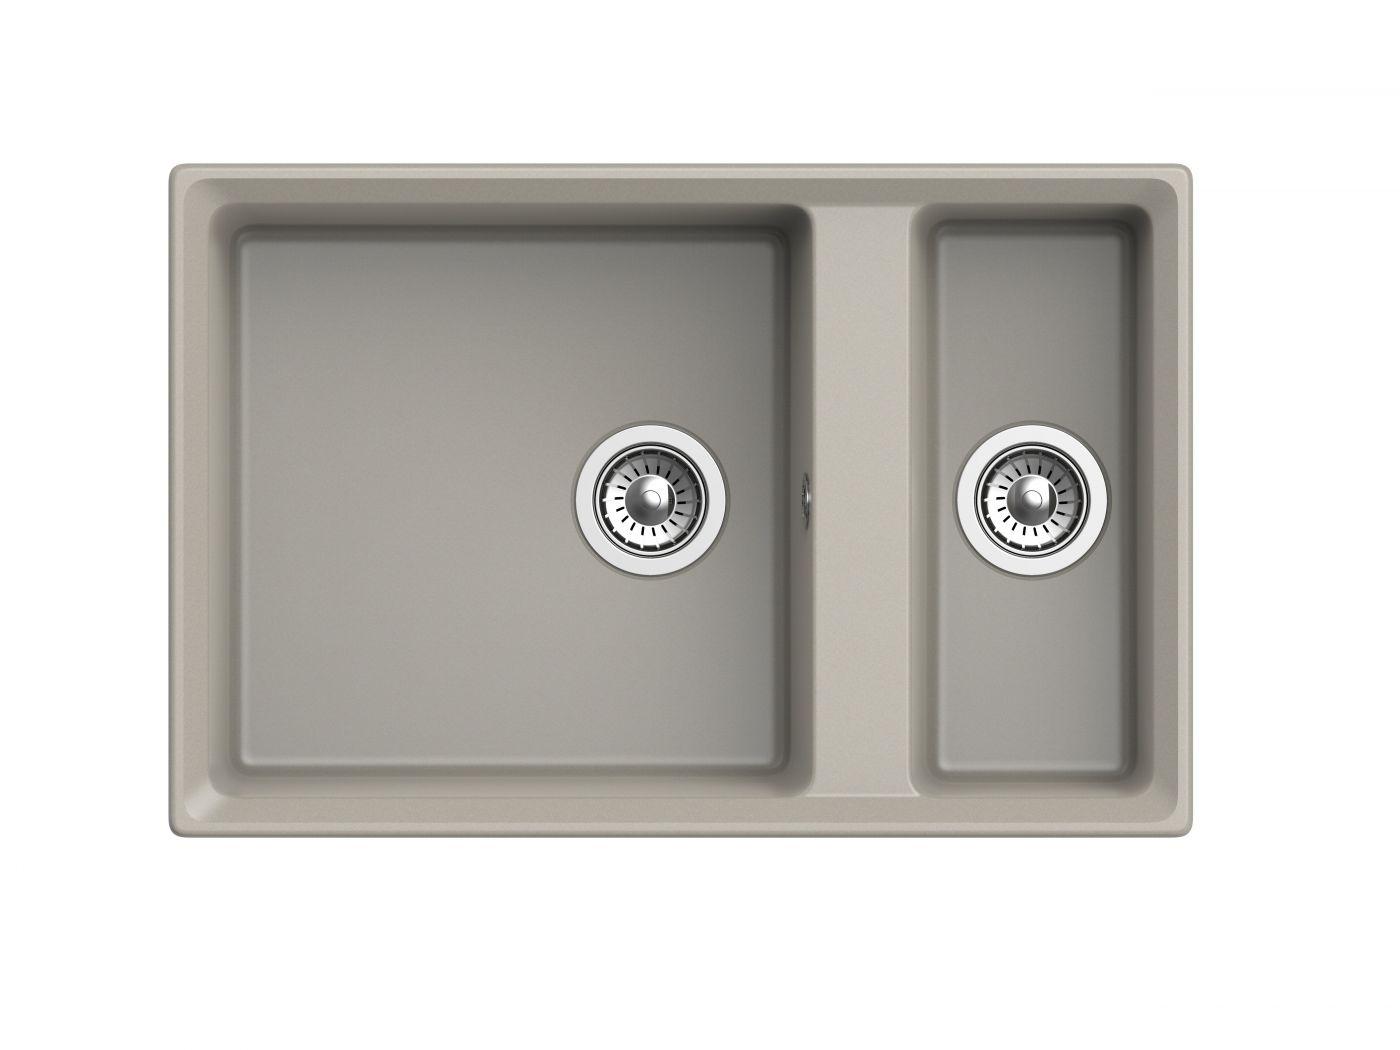 Мраморная мойка для кухни GranFest Level GF-LV760K Топаз